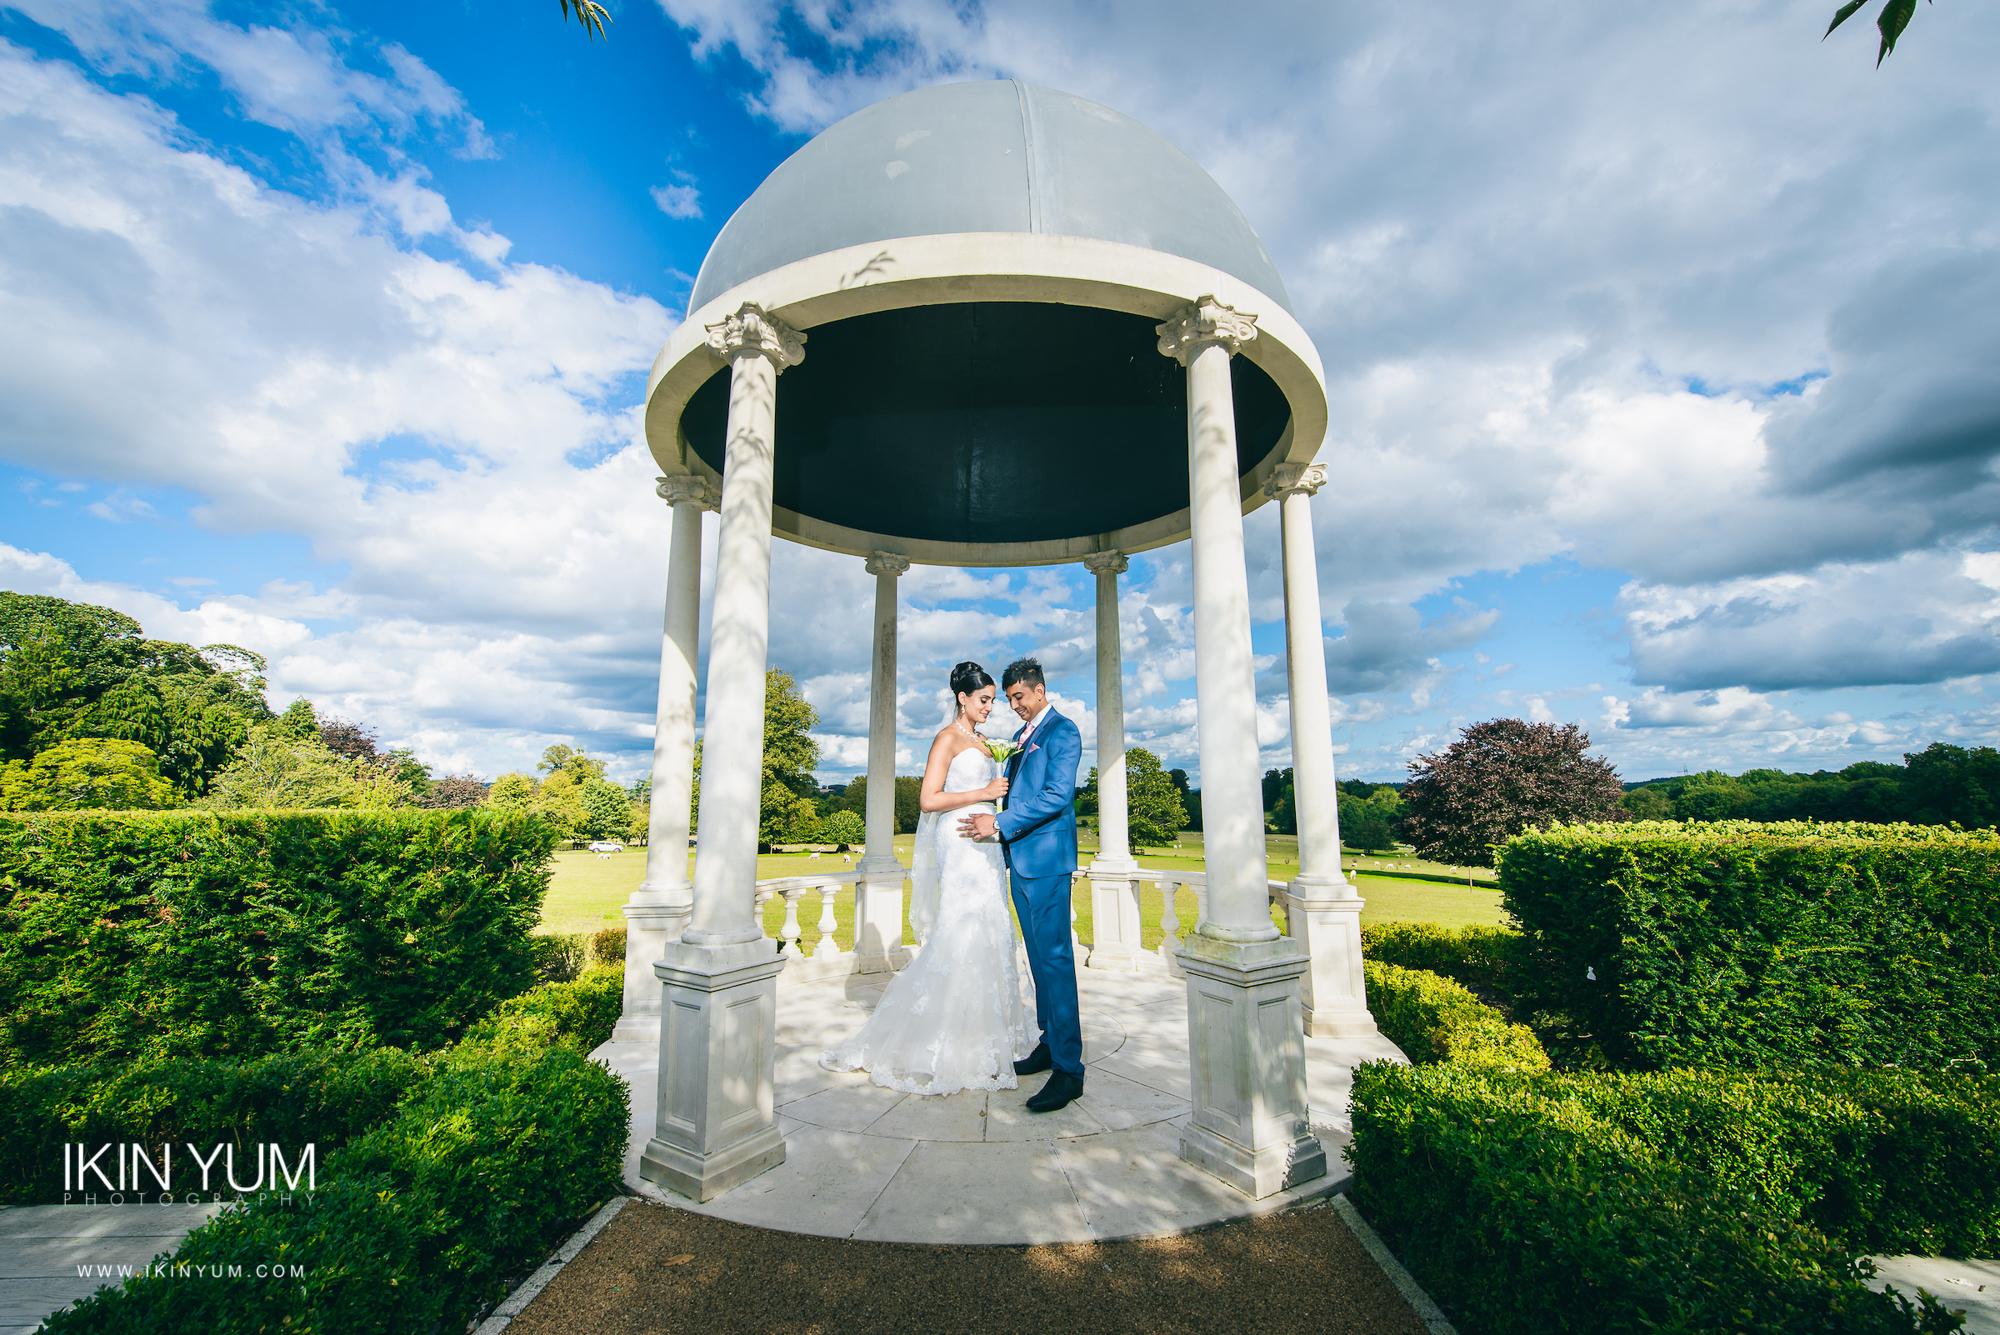 Froyle Park Indian Wedding - Ikin Yum Photography-091.jpg